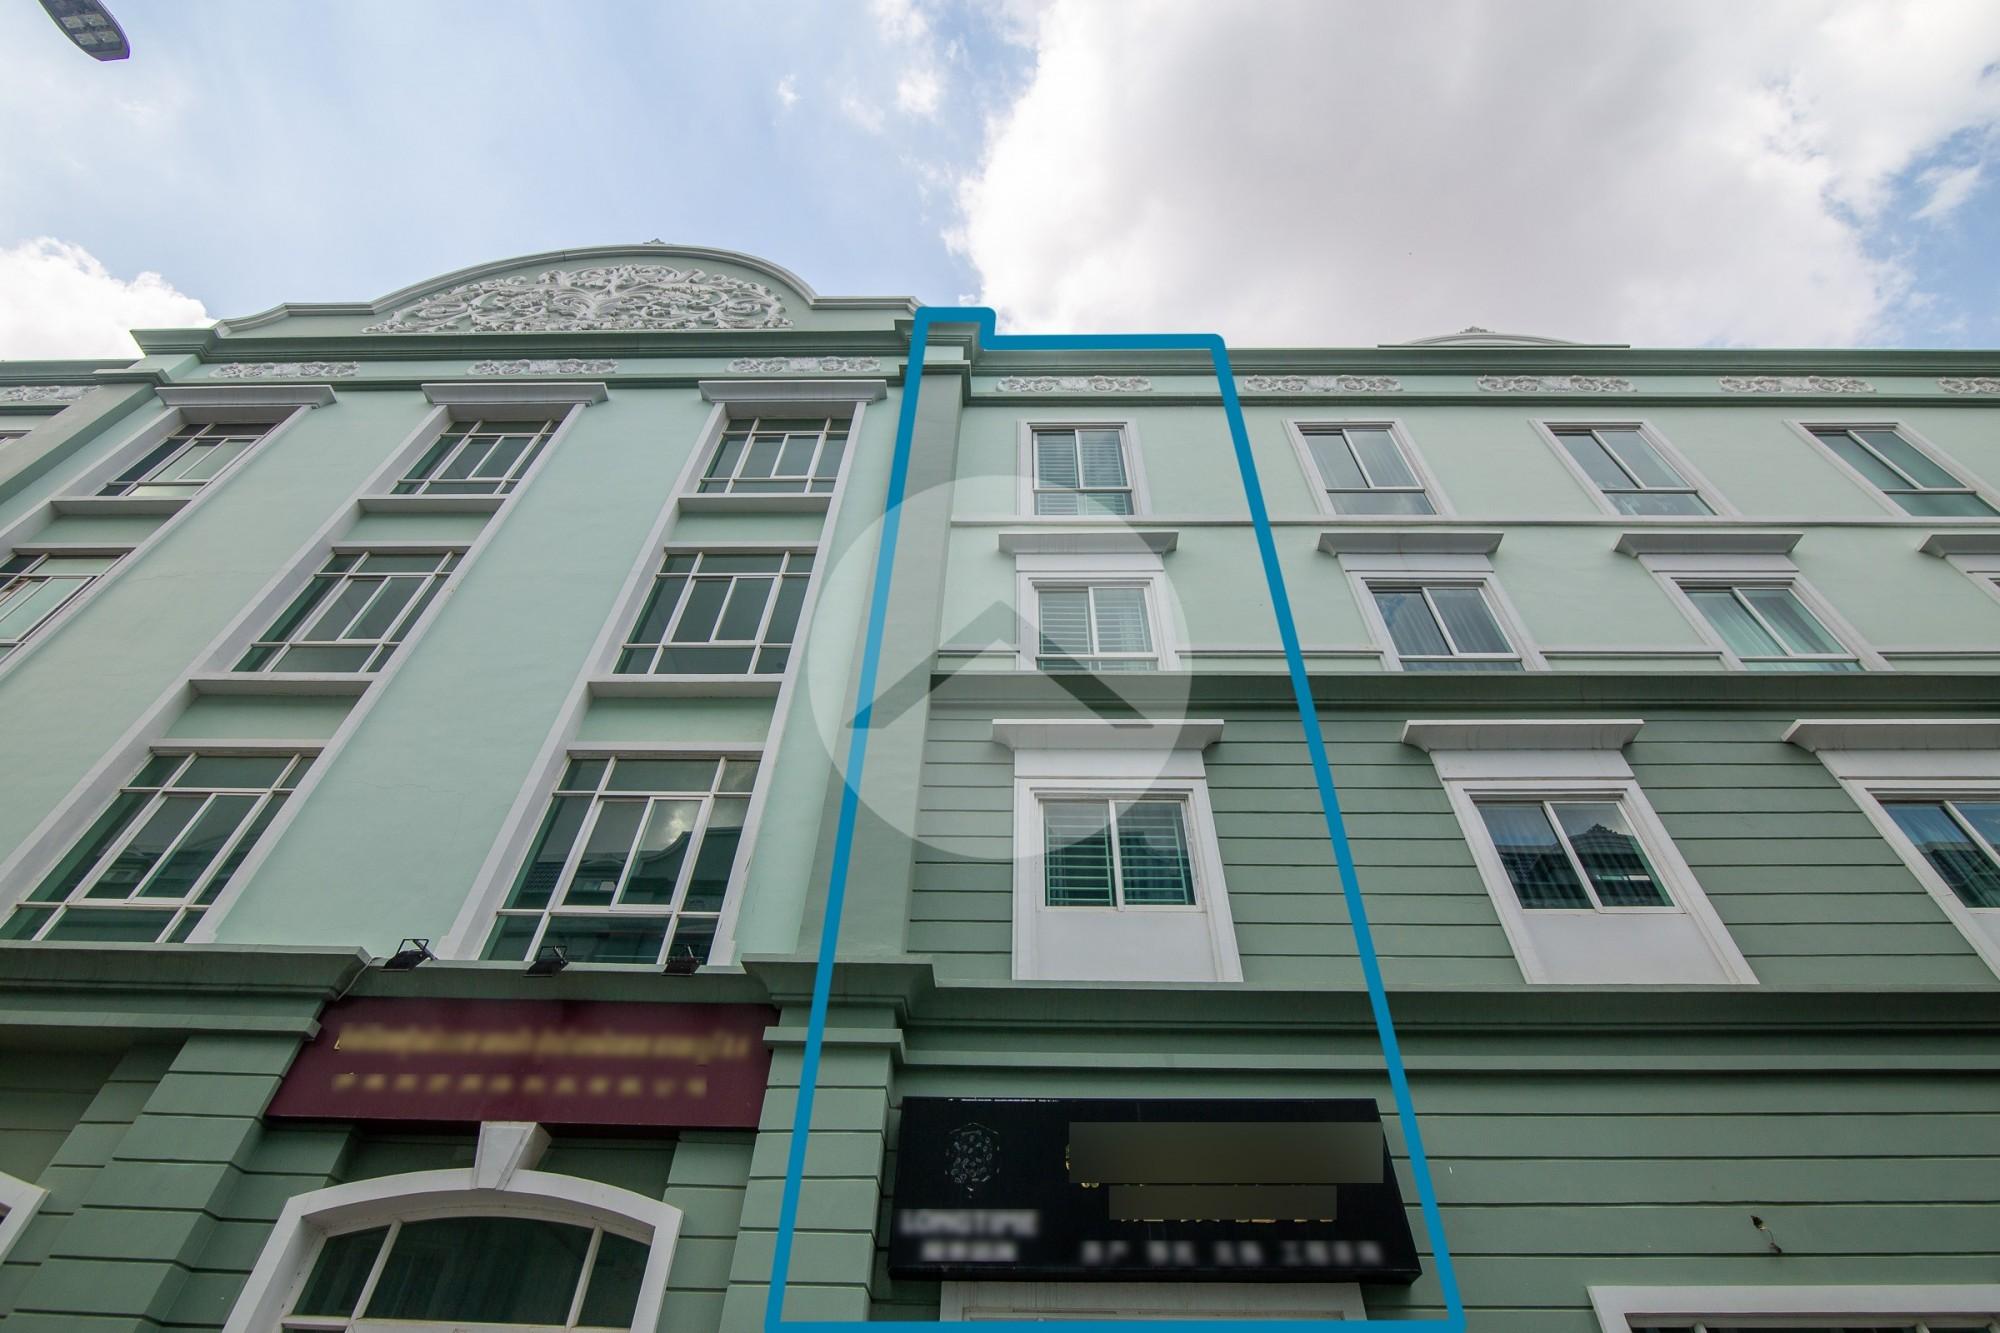 5 Bedroom Shophouse For Rent - Koh Pich, Phnom Penh